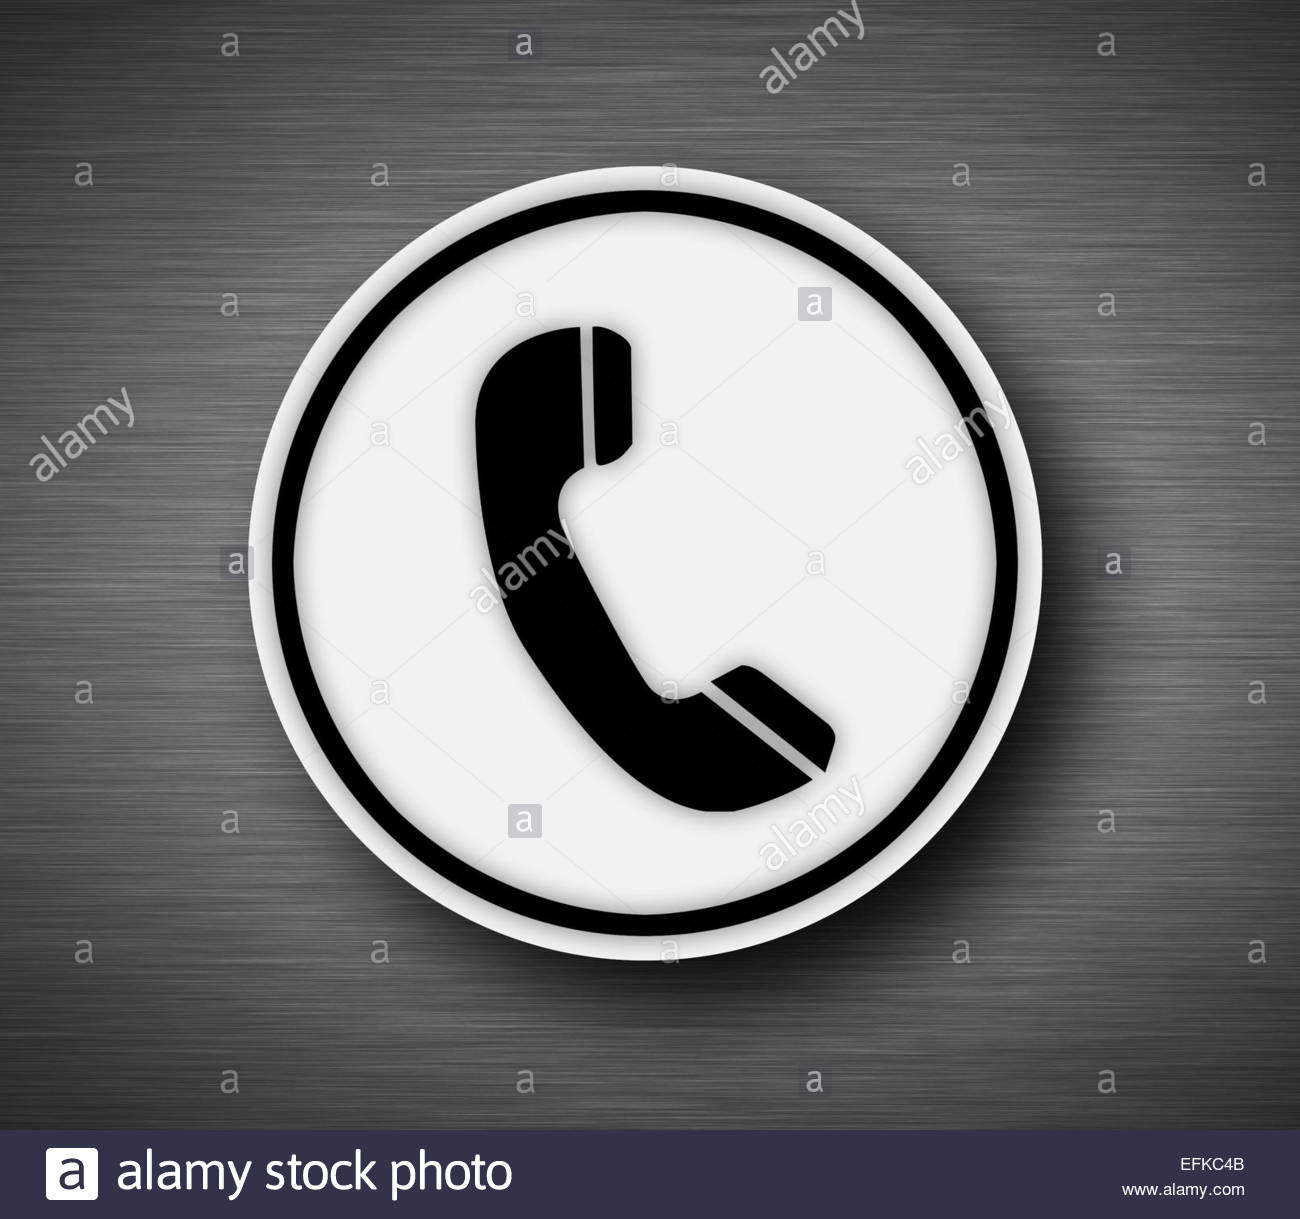 Phone icon on metallic background - Stock Image